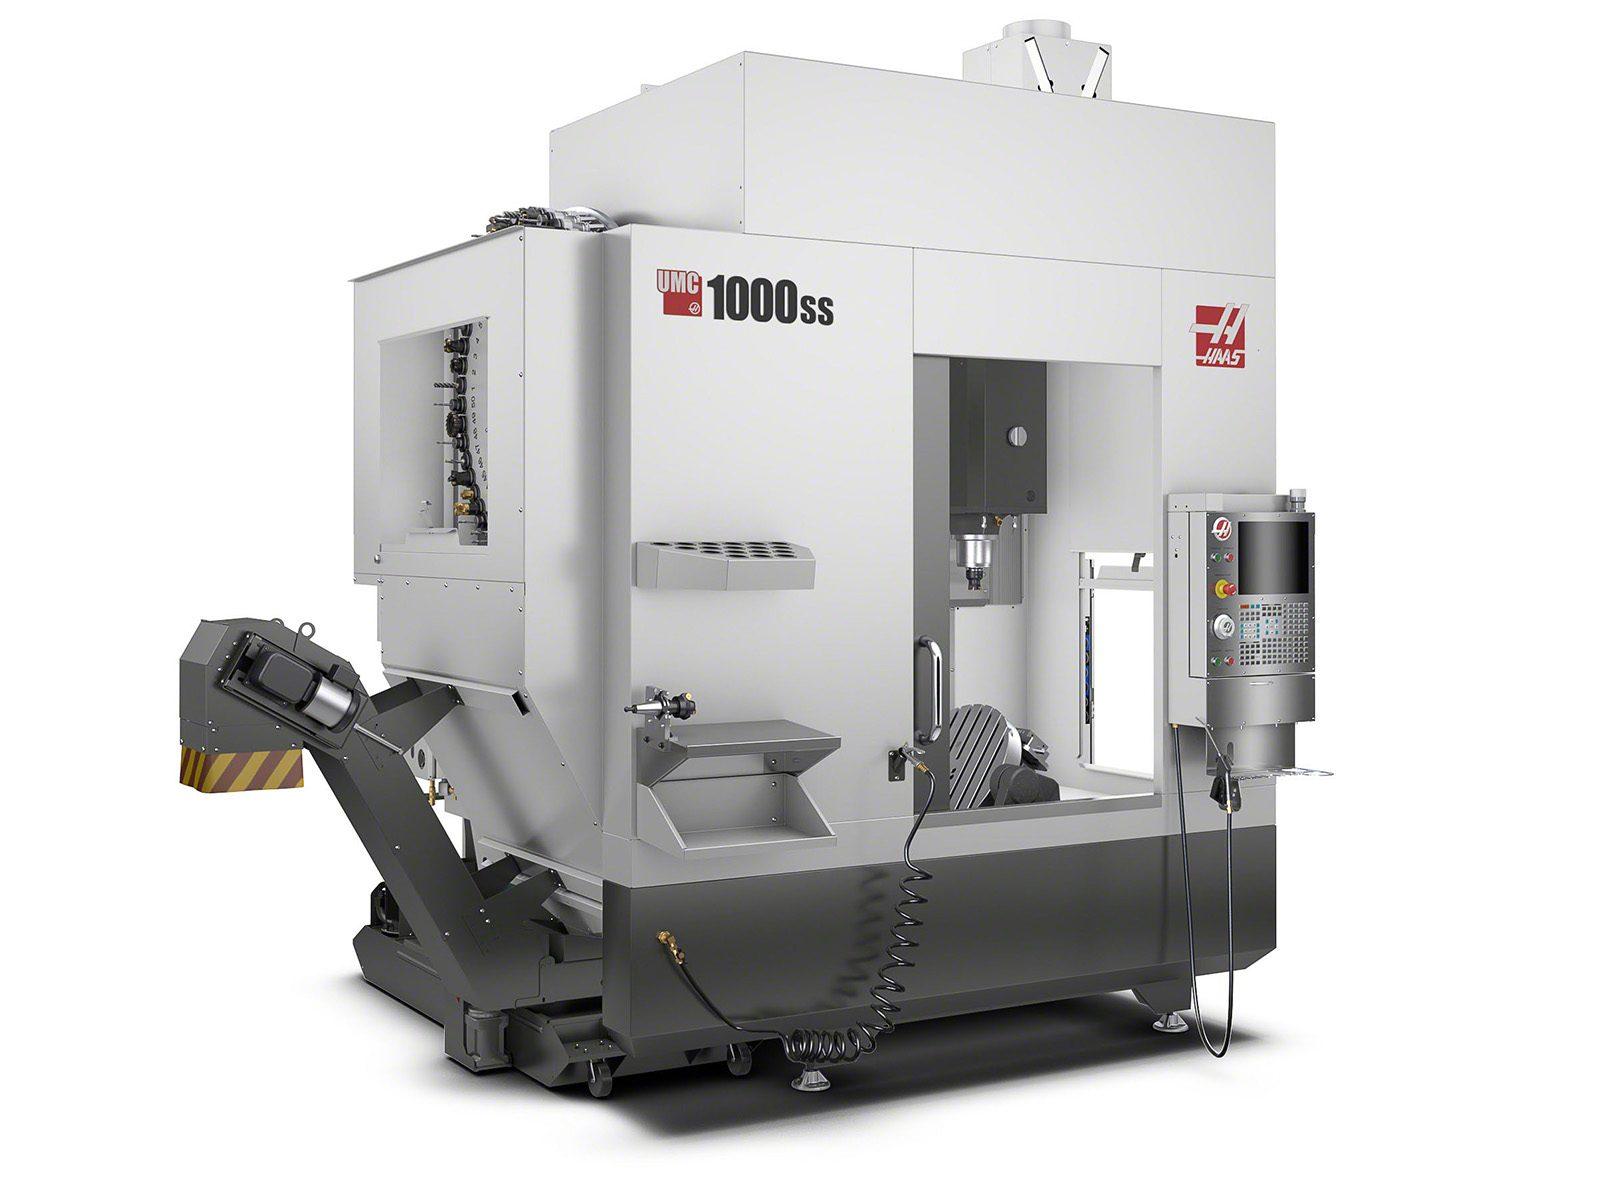 Haas Umc 1000